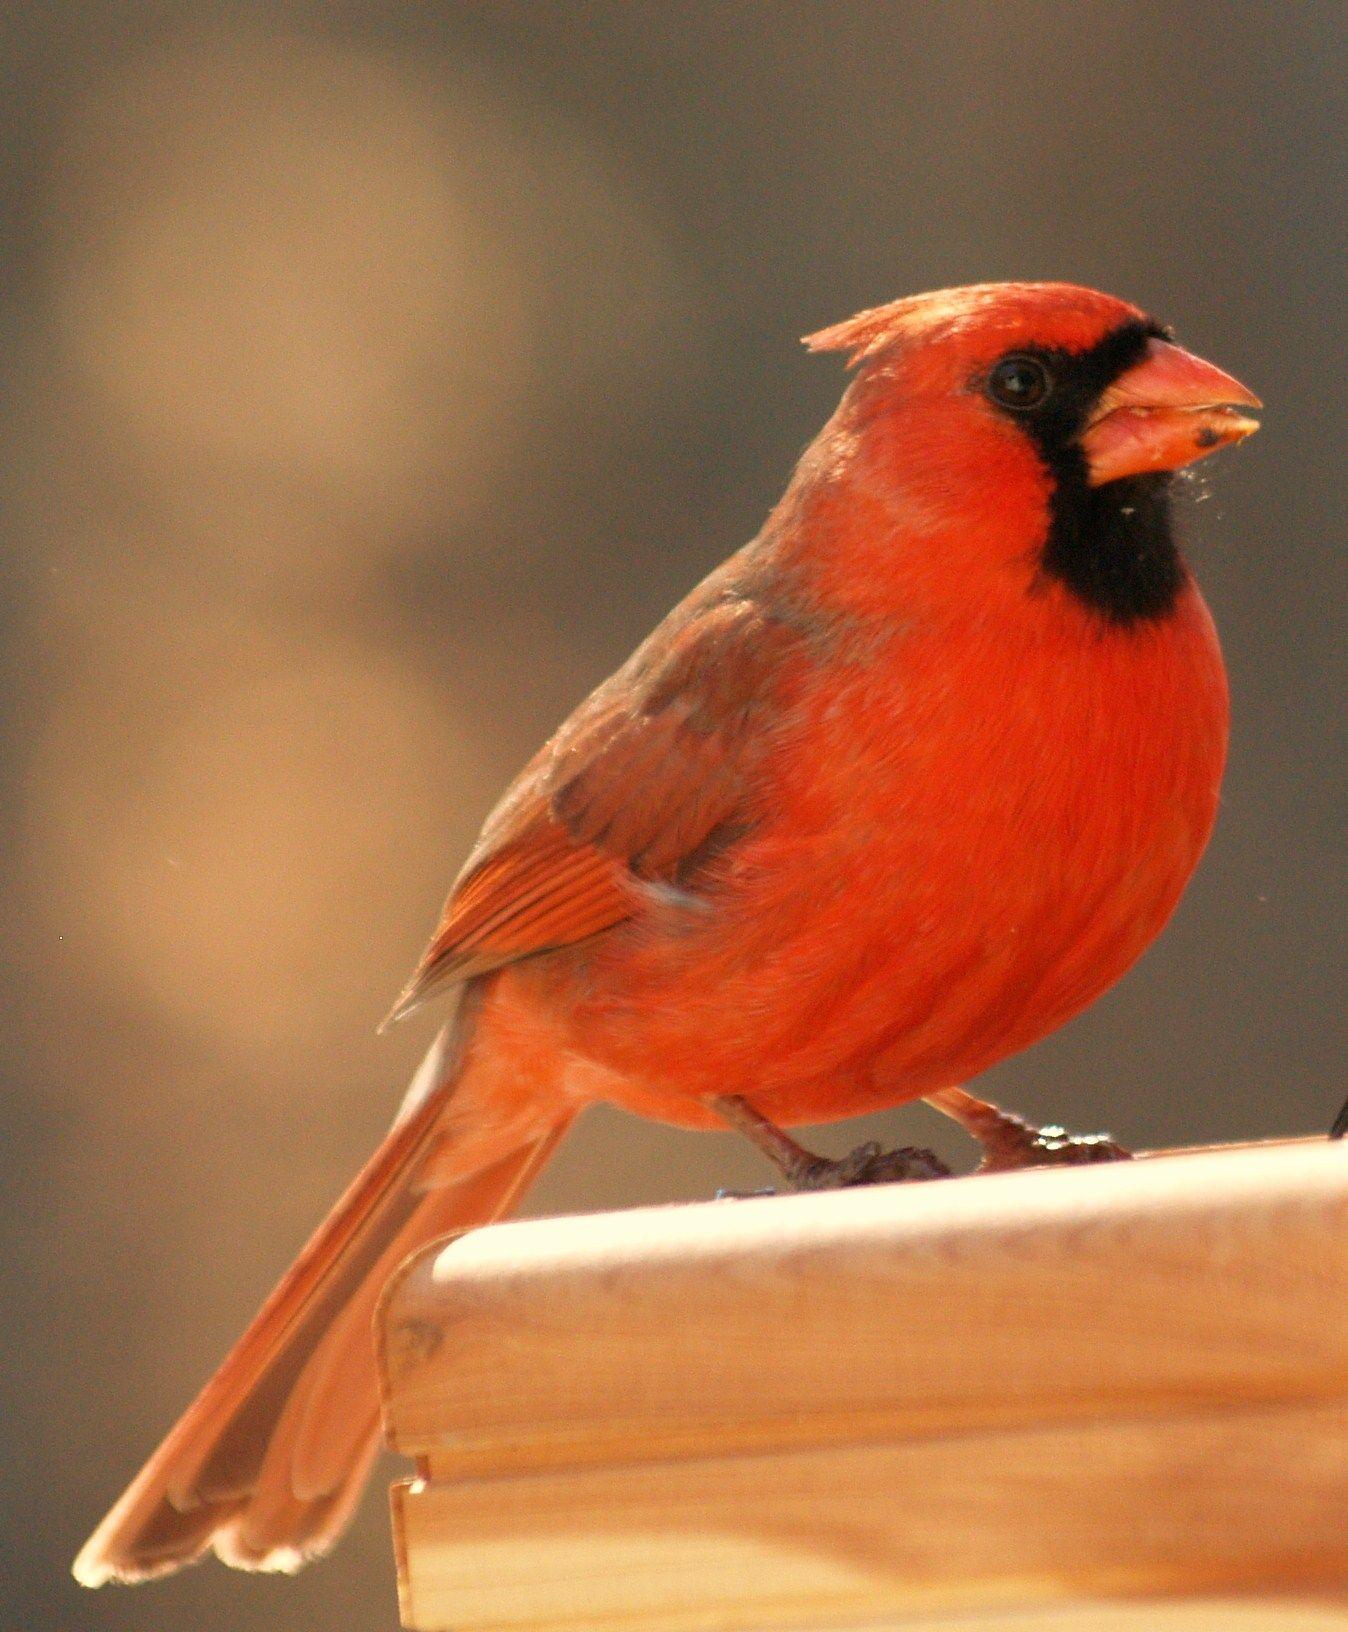 red bird nest and - photo #30